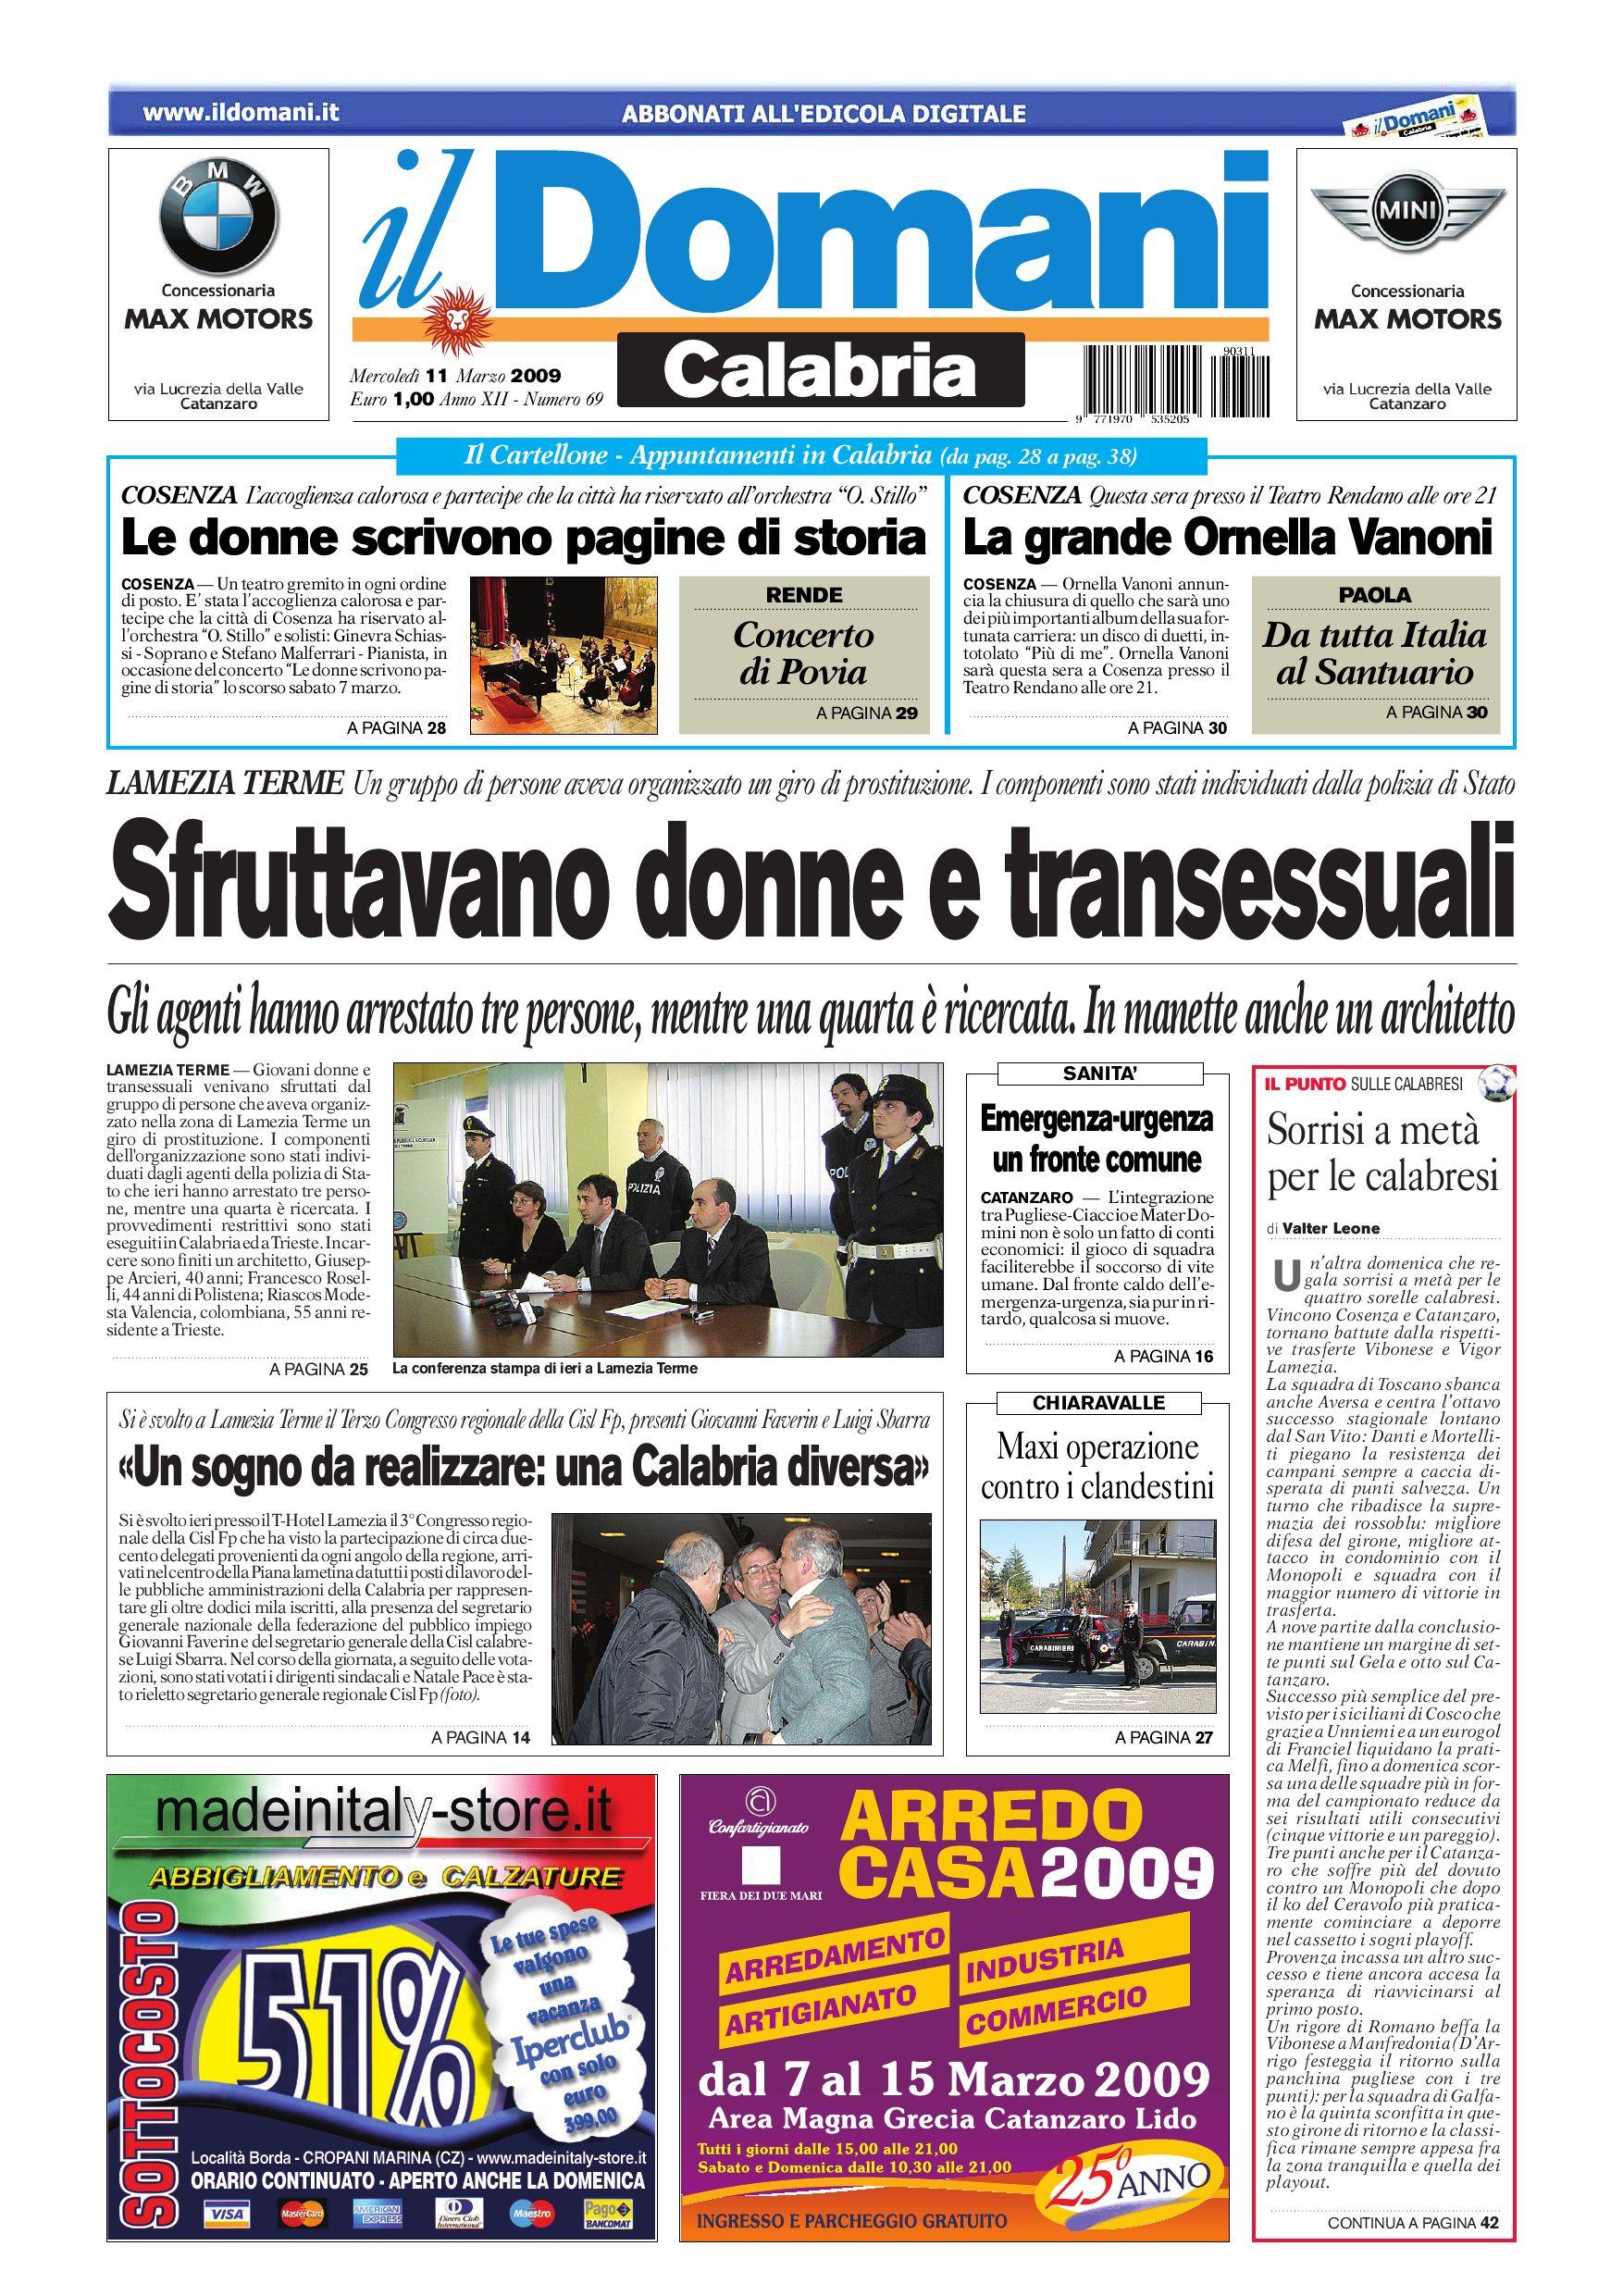 casa in vendita a chiusano a 50000 euro trans italiana torino